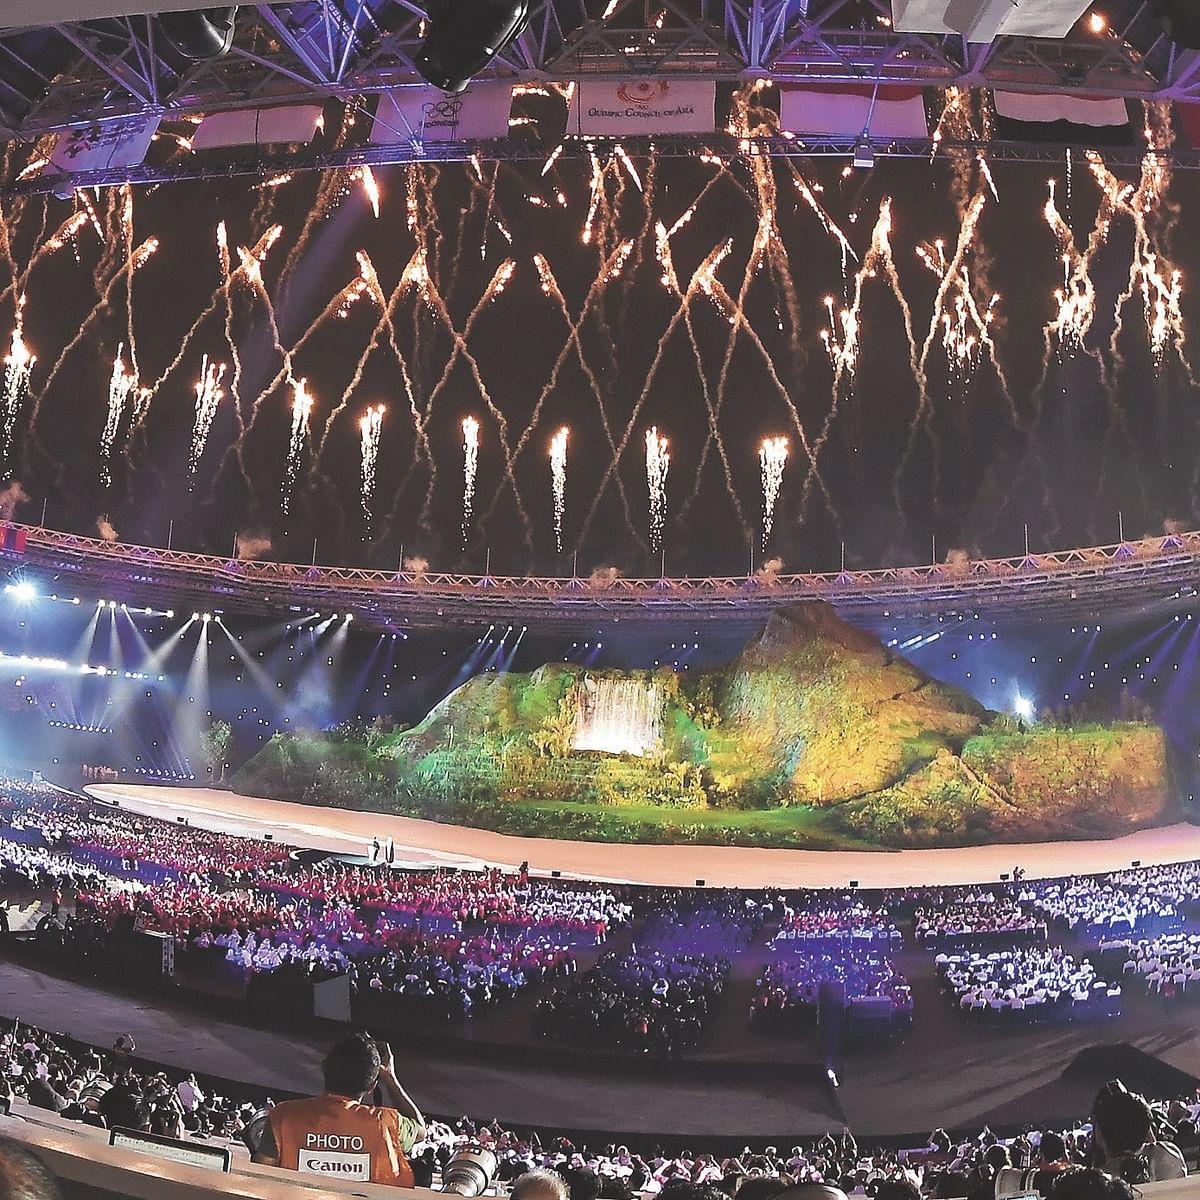 Asian Games 2018: The good, better, best; never let it rest